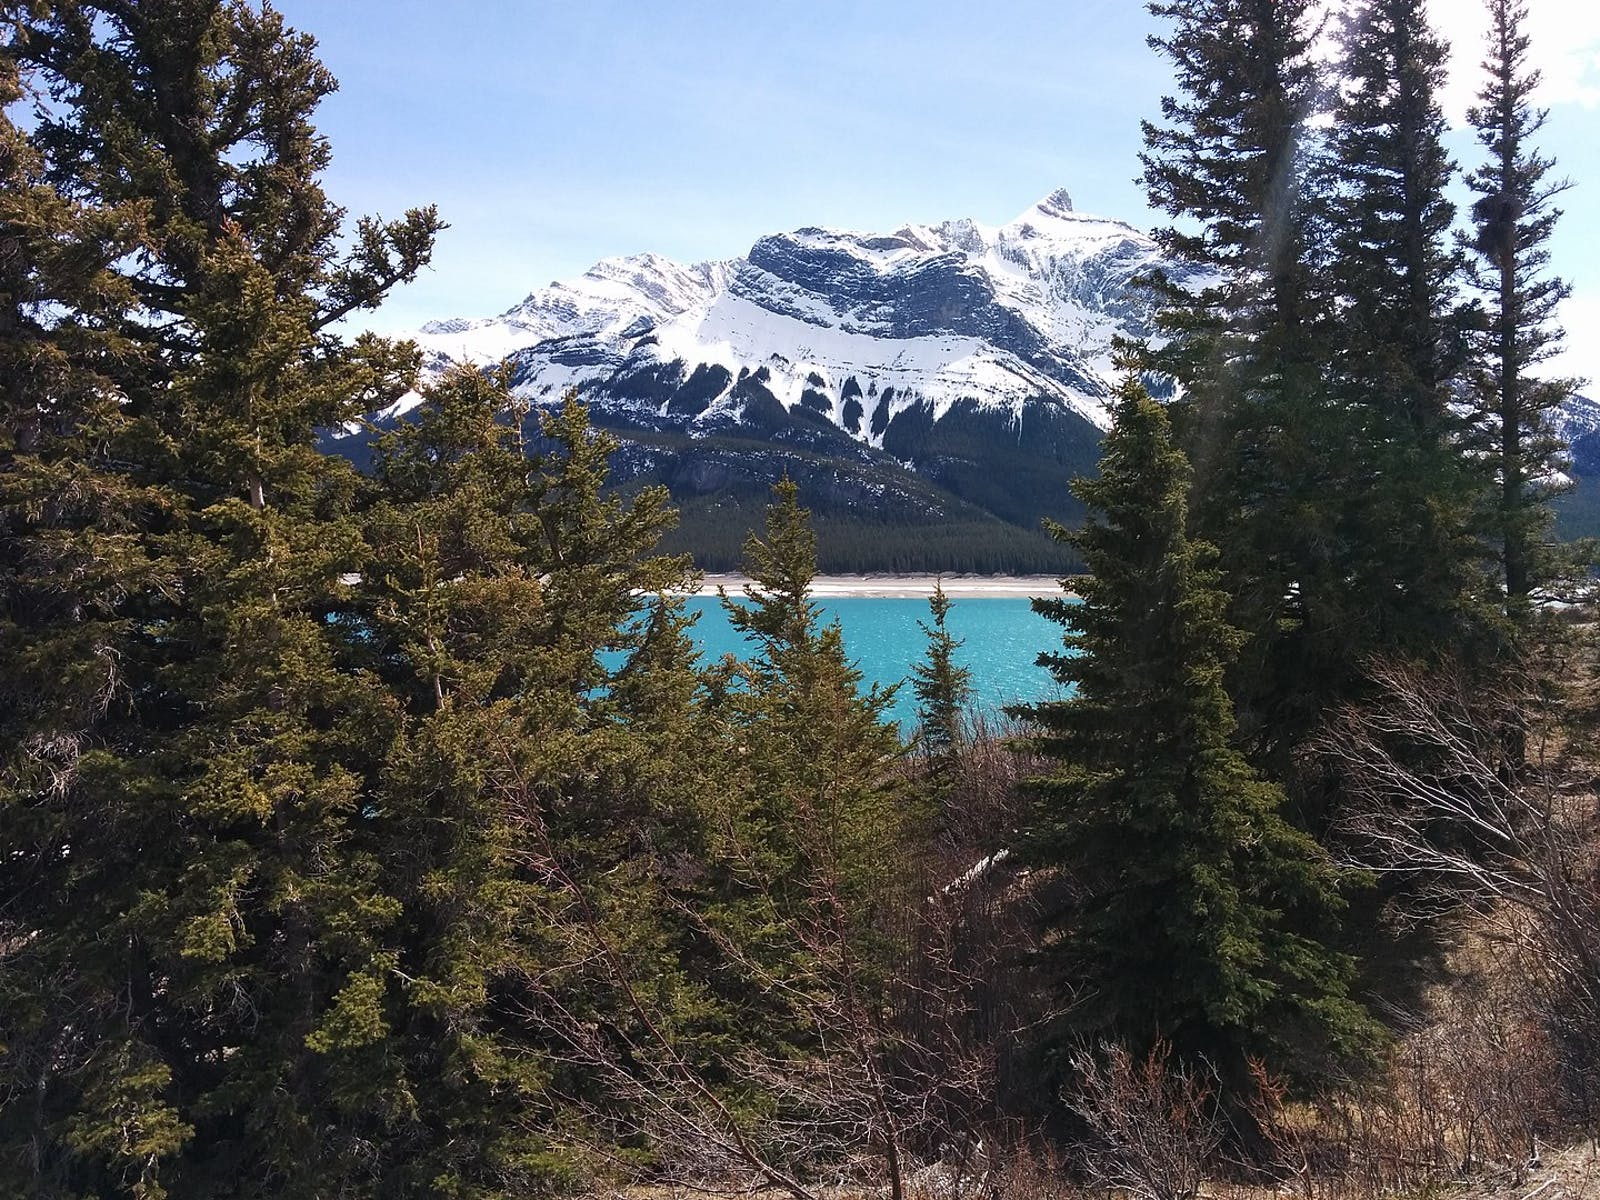 Alberta-British Columbia Foothills Forests